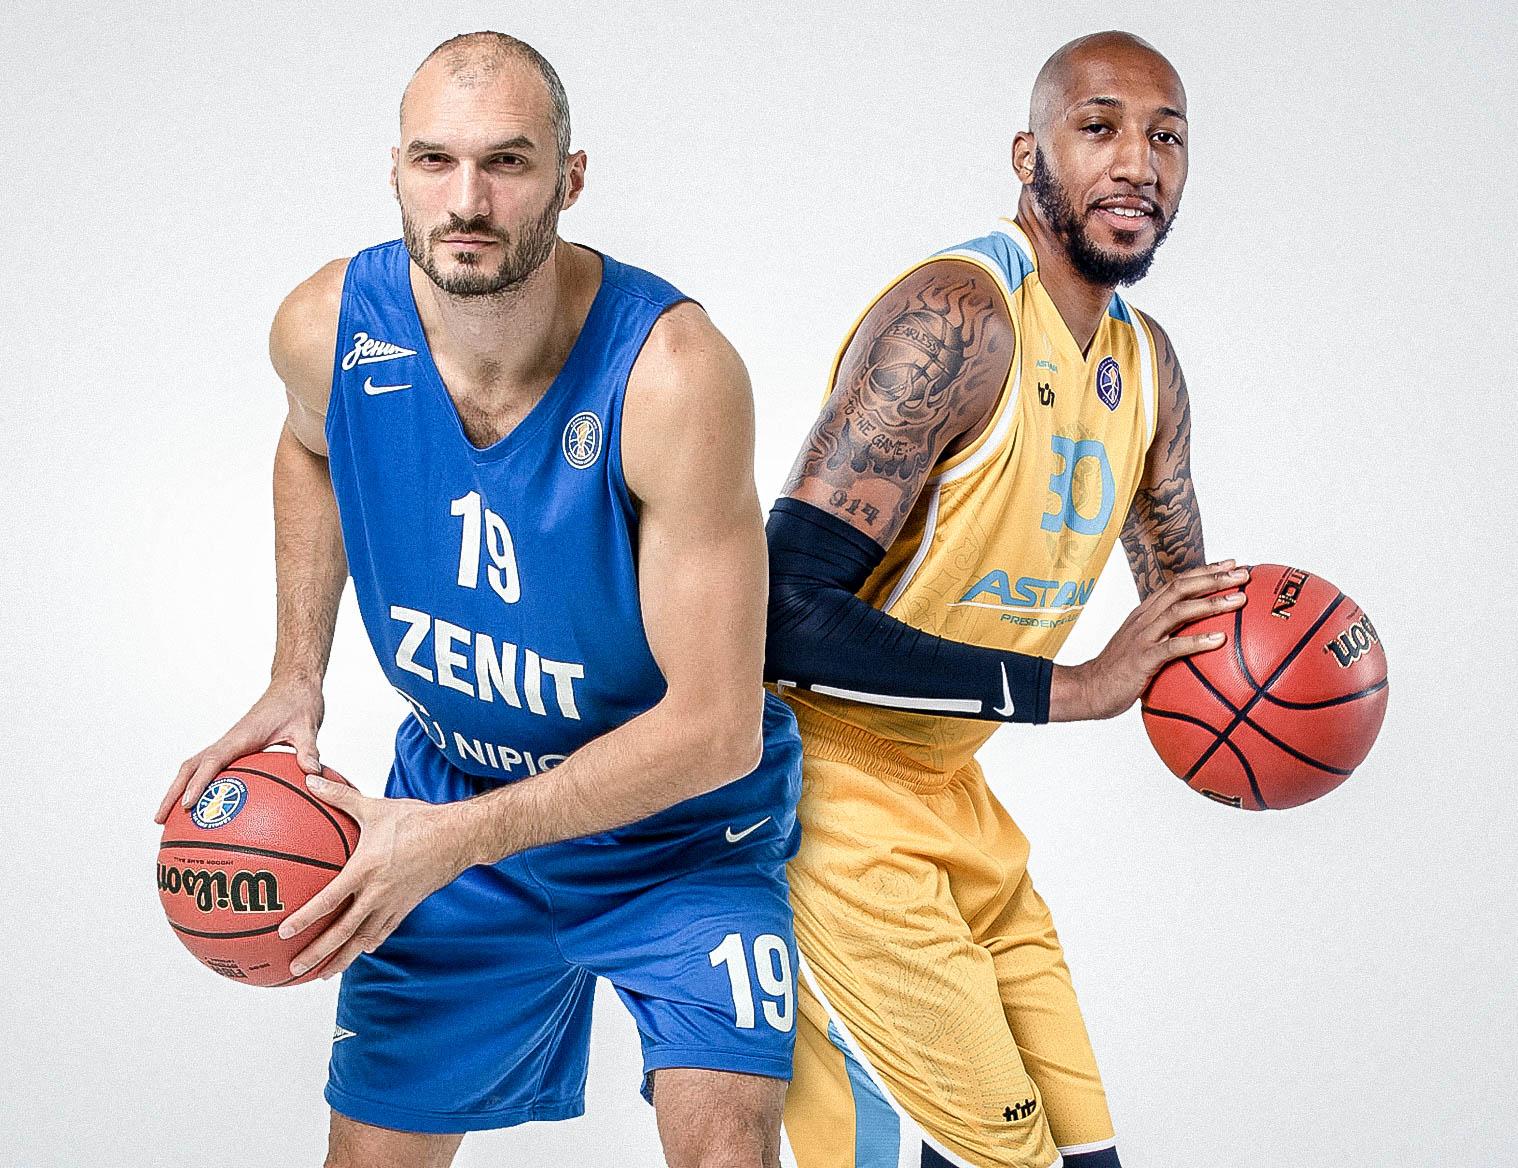 Матч недели. Кто пятый — «Зенит» или «Астана»?